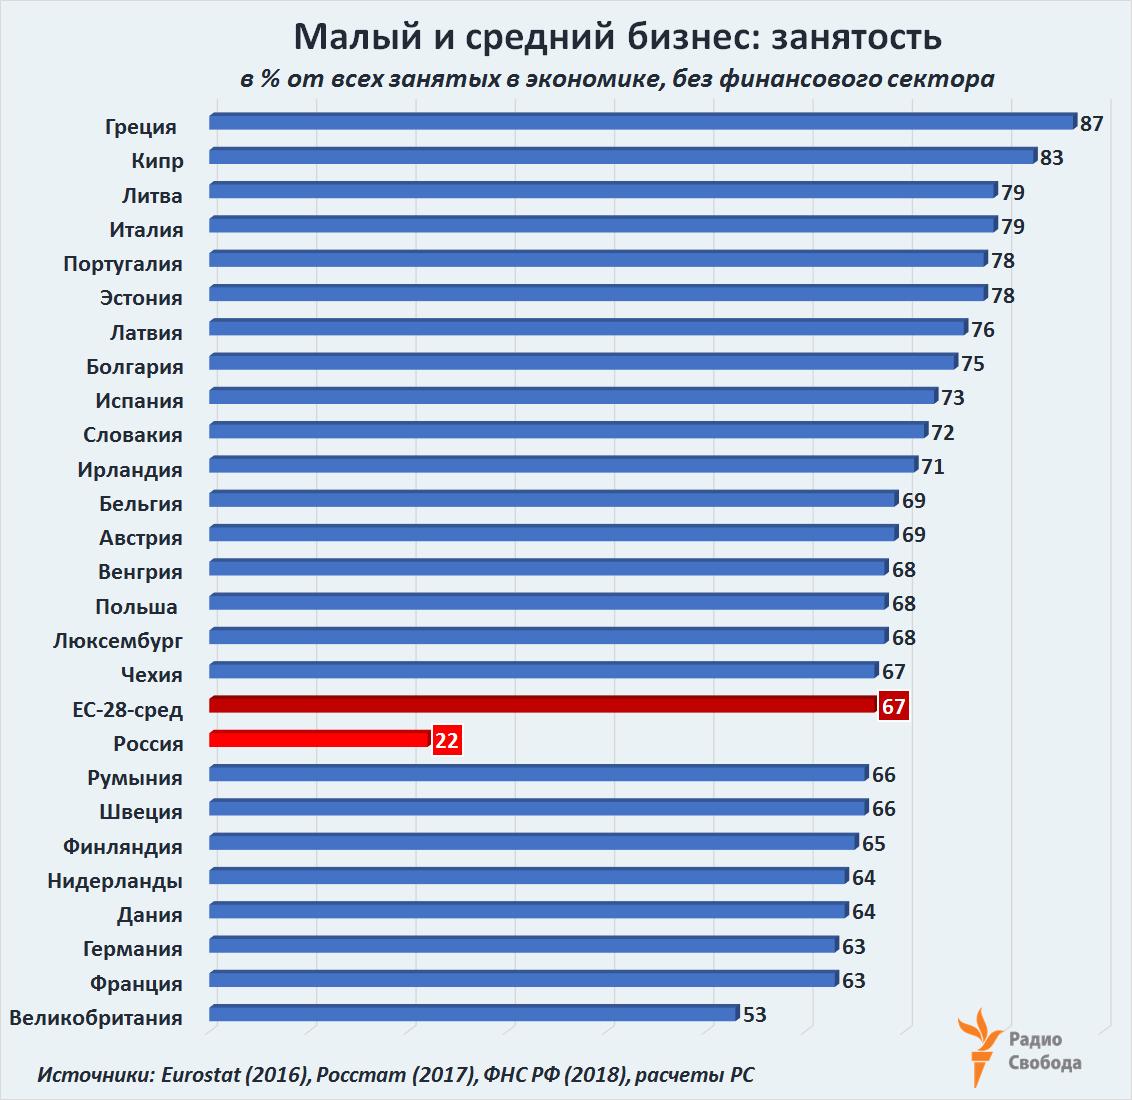 Russia-Factograph-SME-Employment-Share-EU-Russia